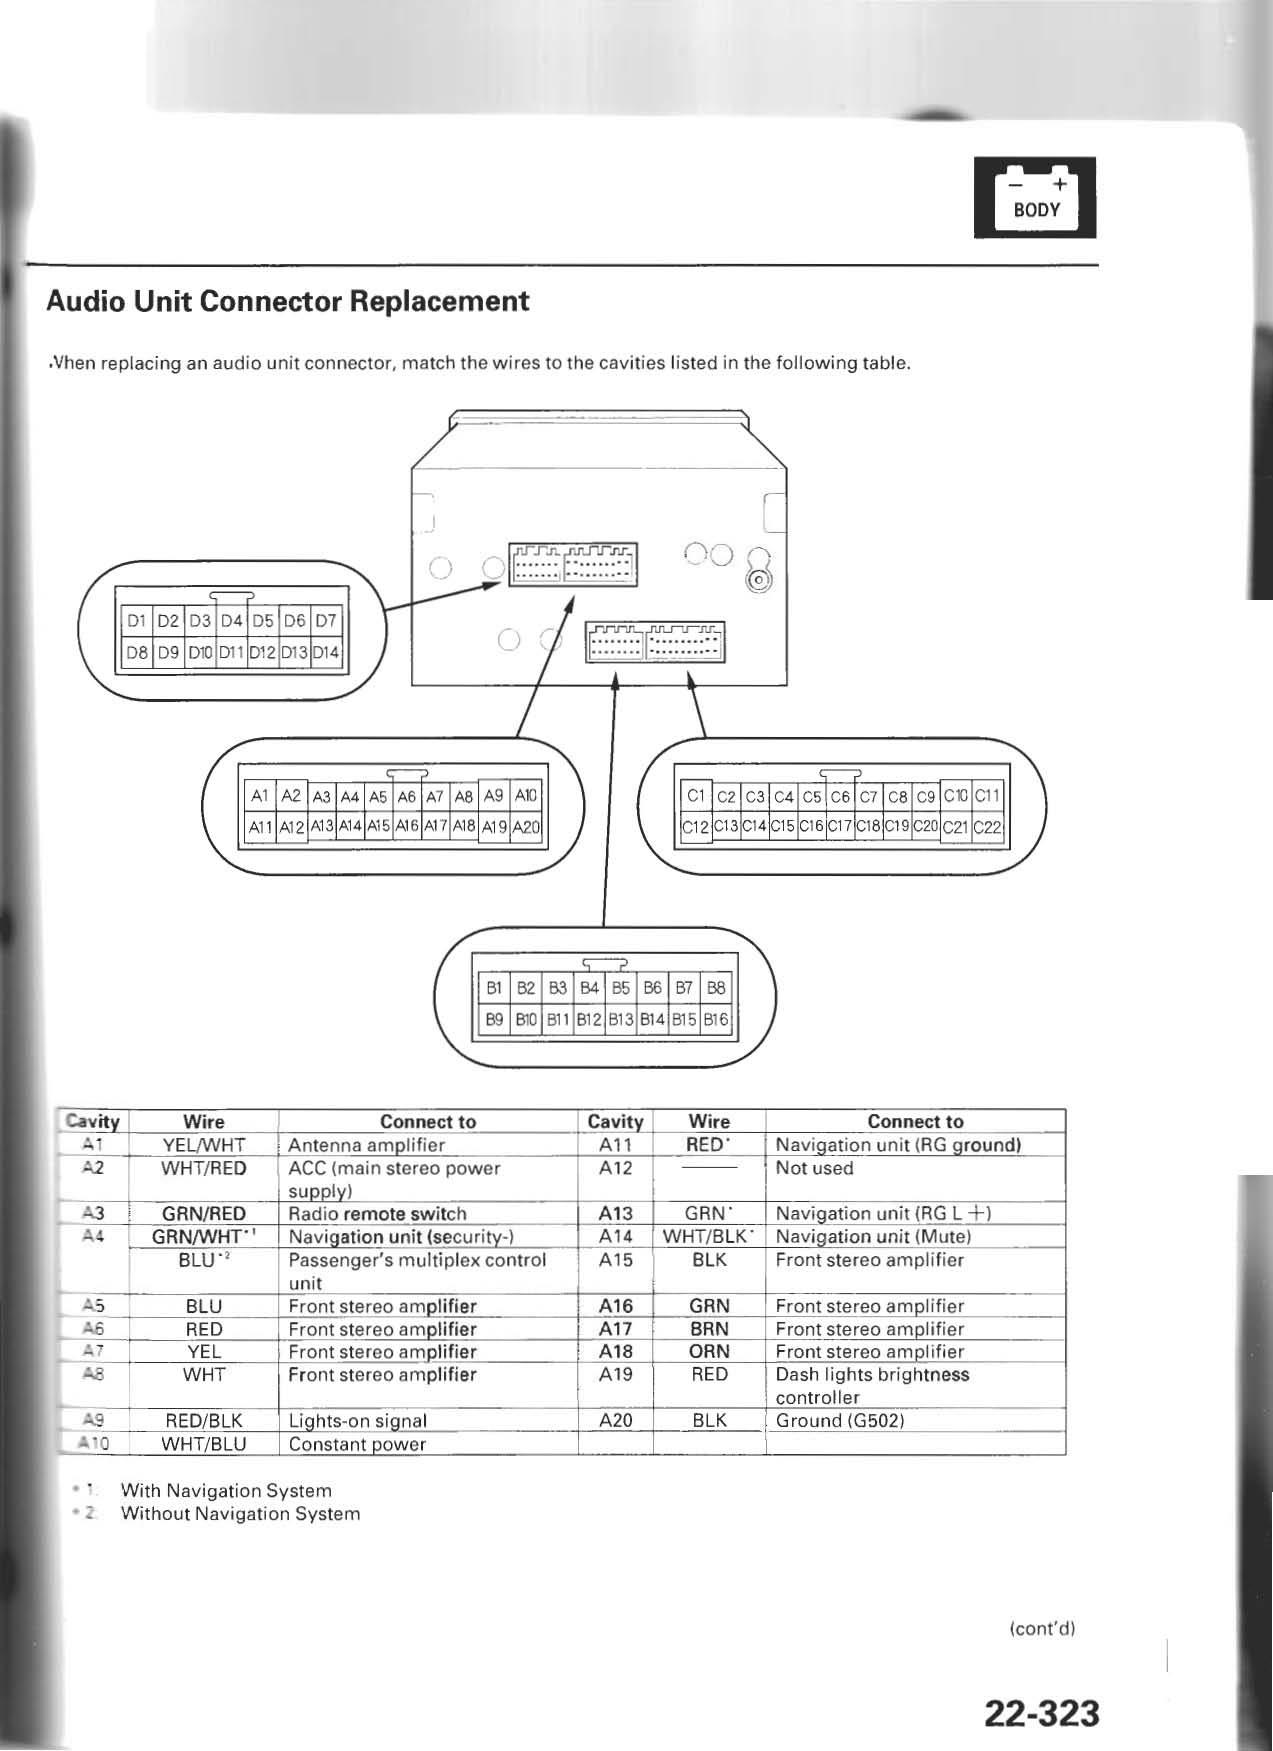 2004 Acura Mdx Radio Wiring Diagram Key1